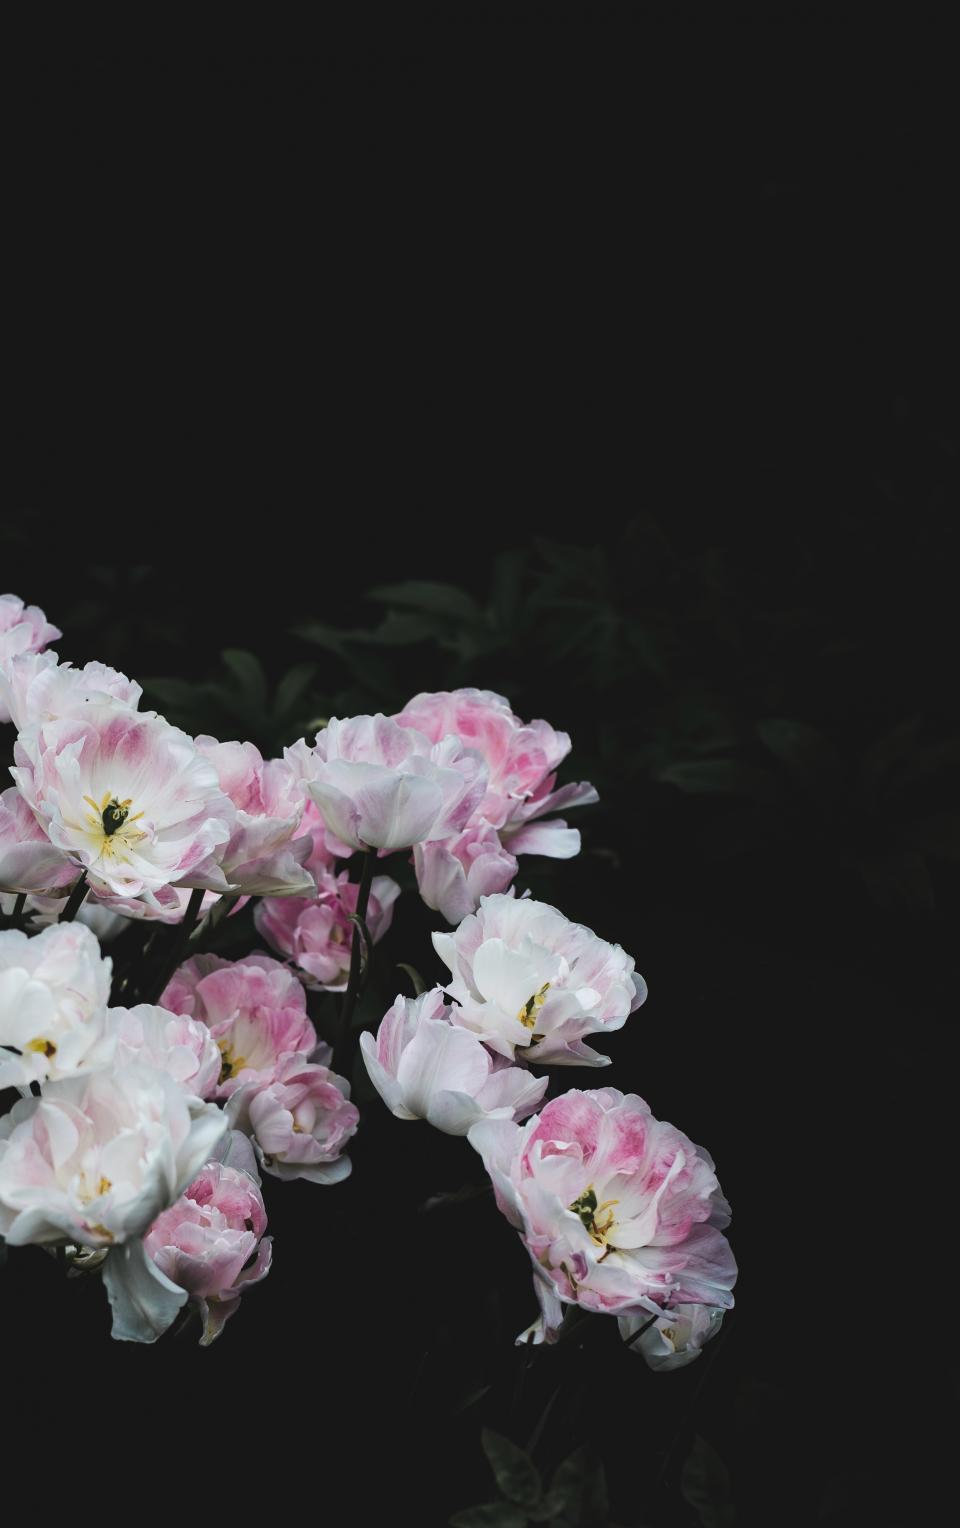 white, flower, bloom, blossoms, nature, plant